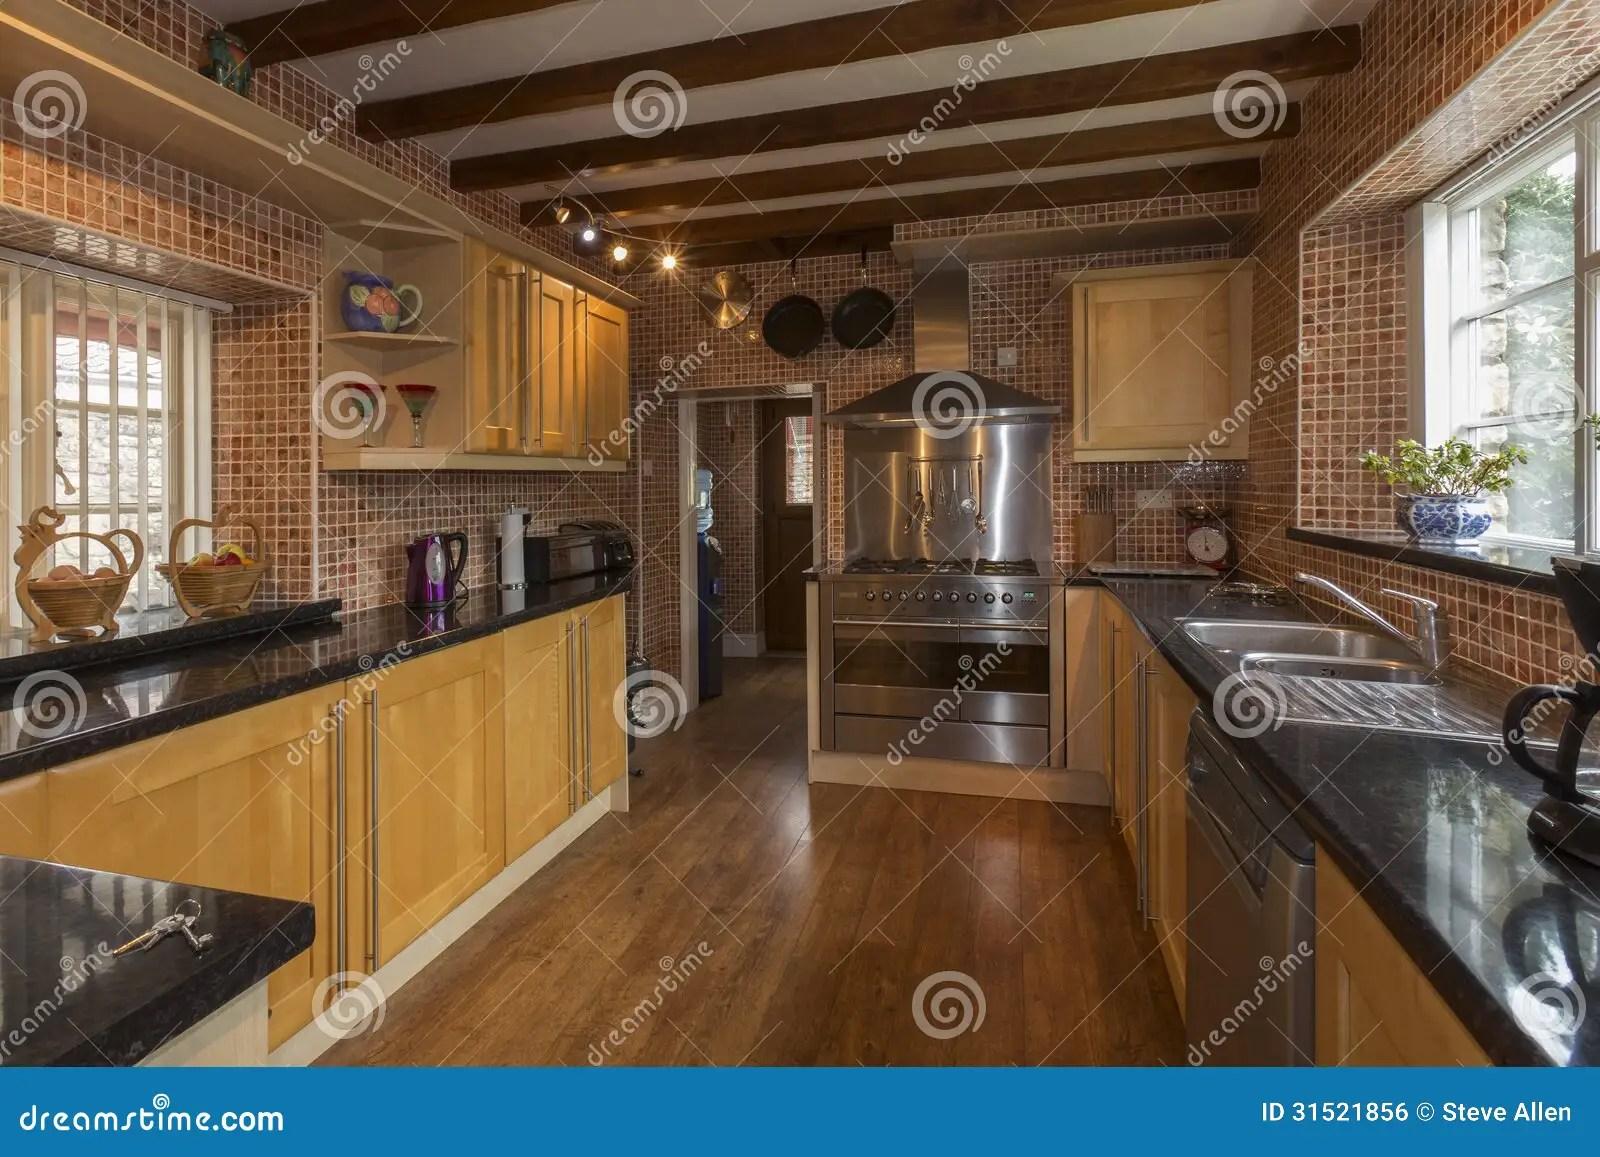 kitchen sink farmhouse custom sinks 农舍厨房库存照片 图片包括有烹饪器材 厨房 房子 机柜 里面 烹调法 一个农舍厨房在一个房子里在约克夏在东北英国